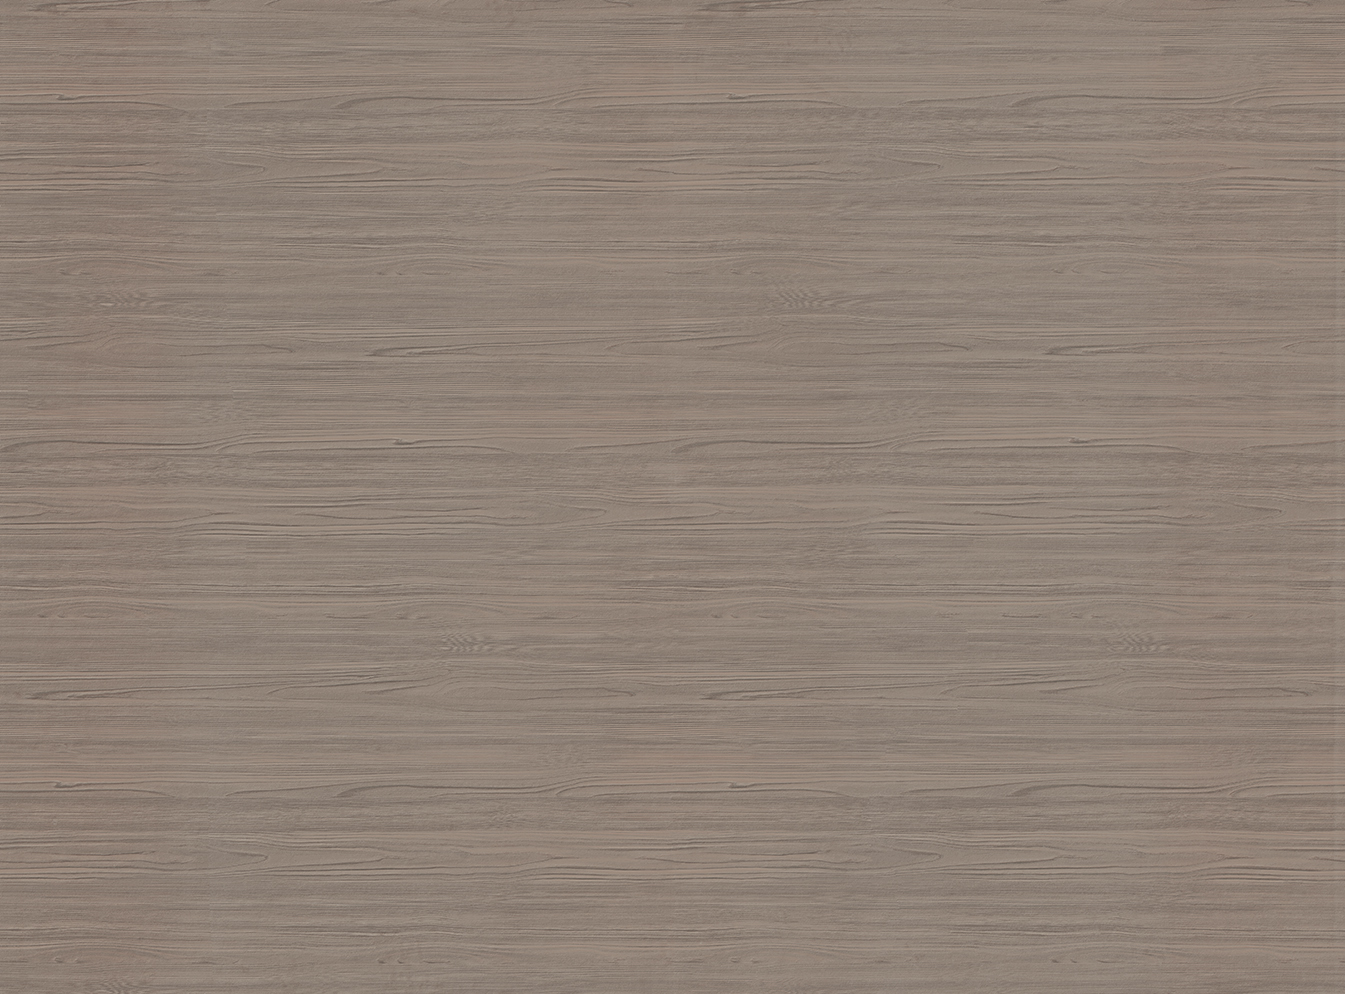 Лента AБC S136 23/1 Esperia